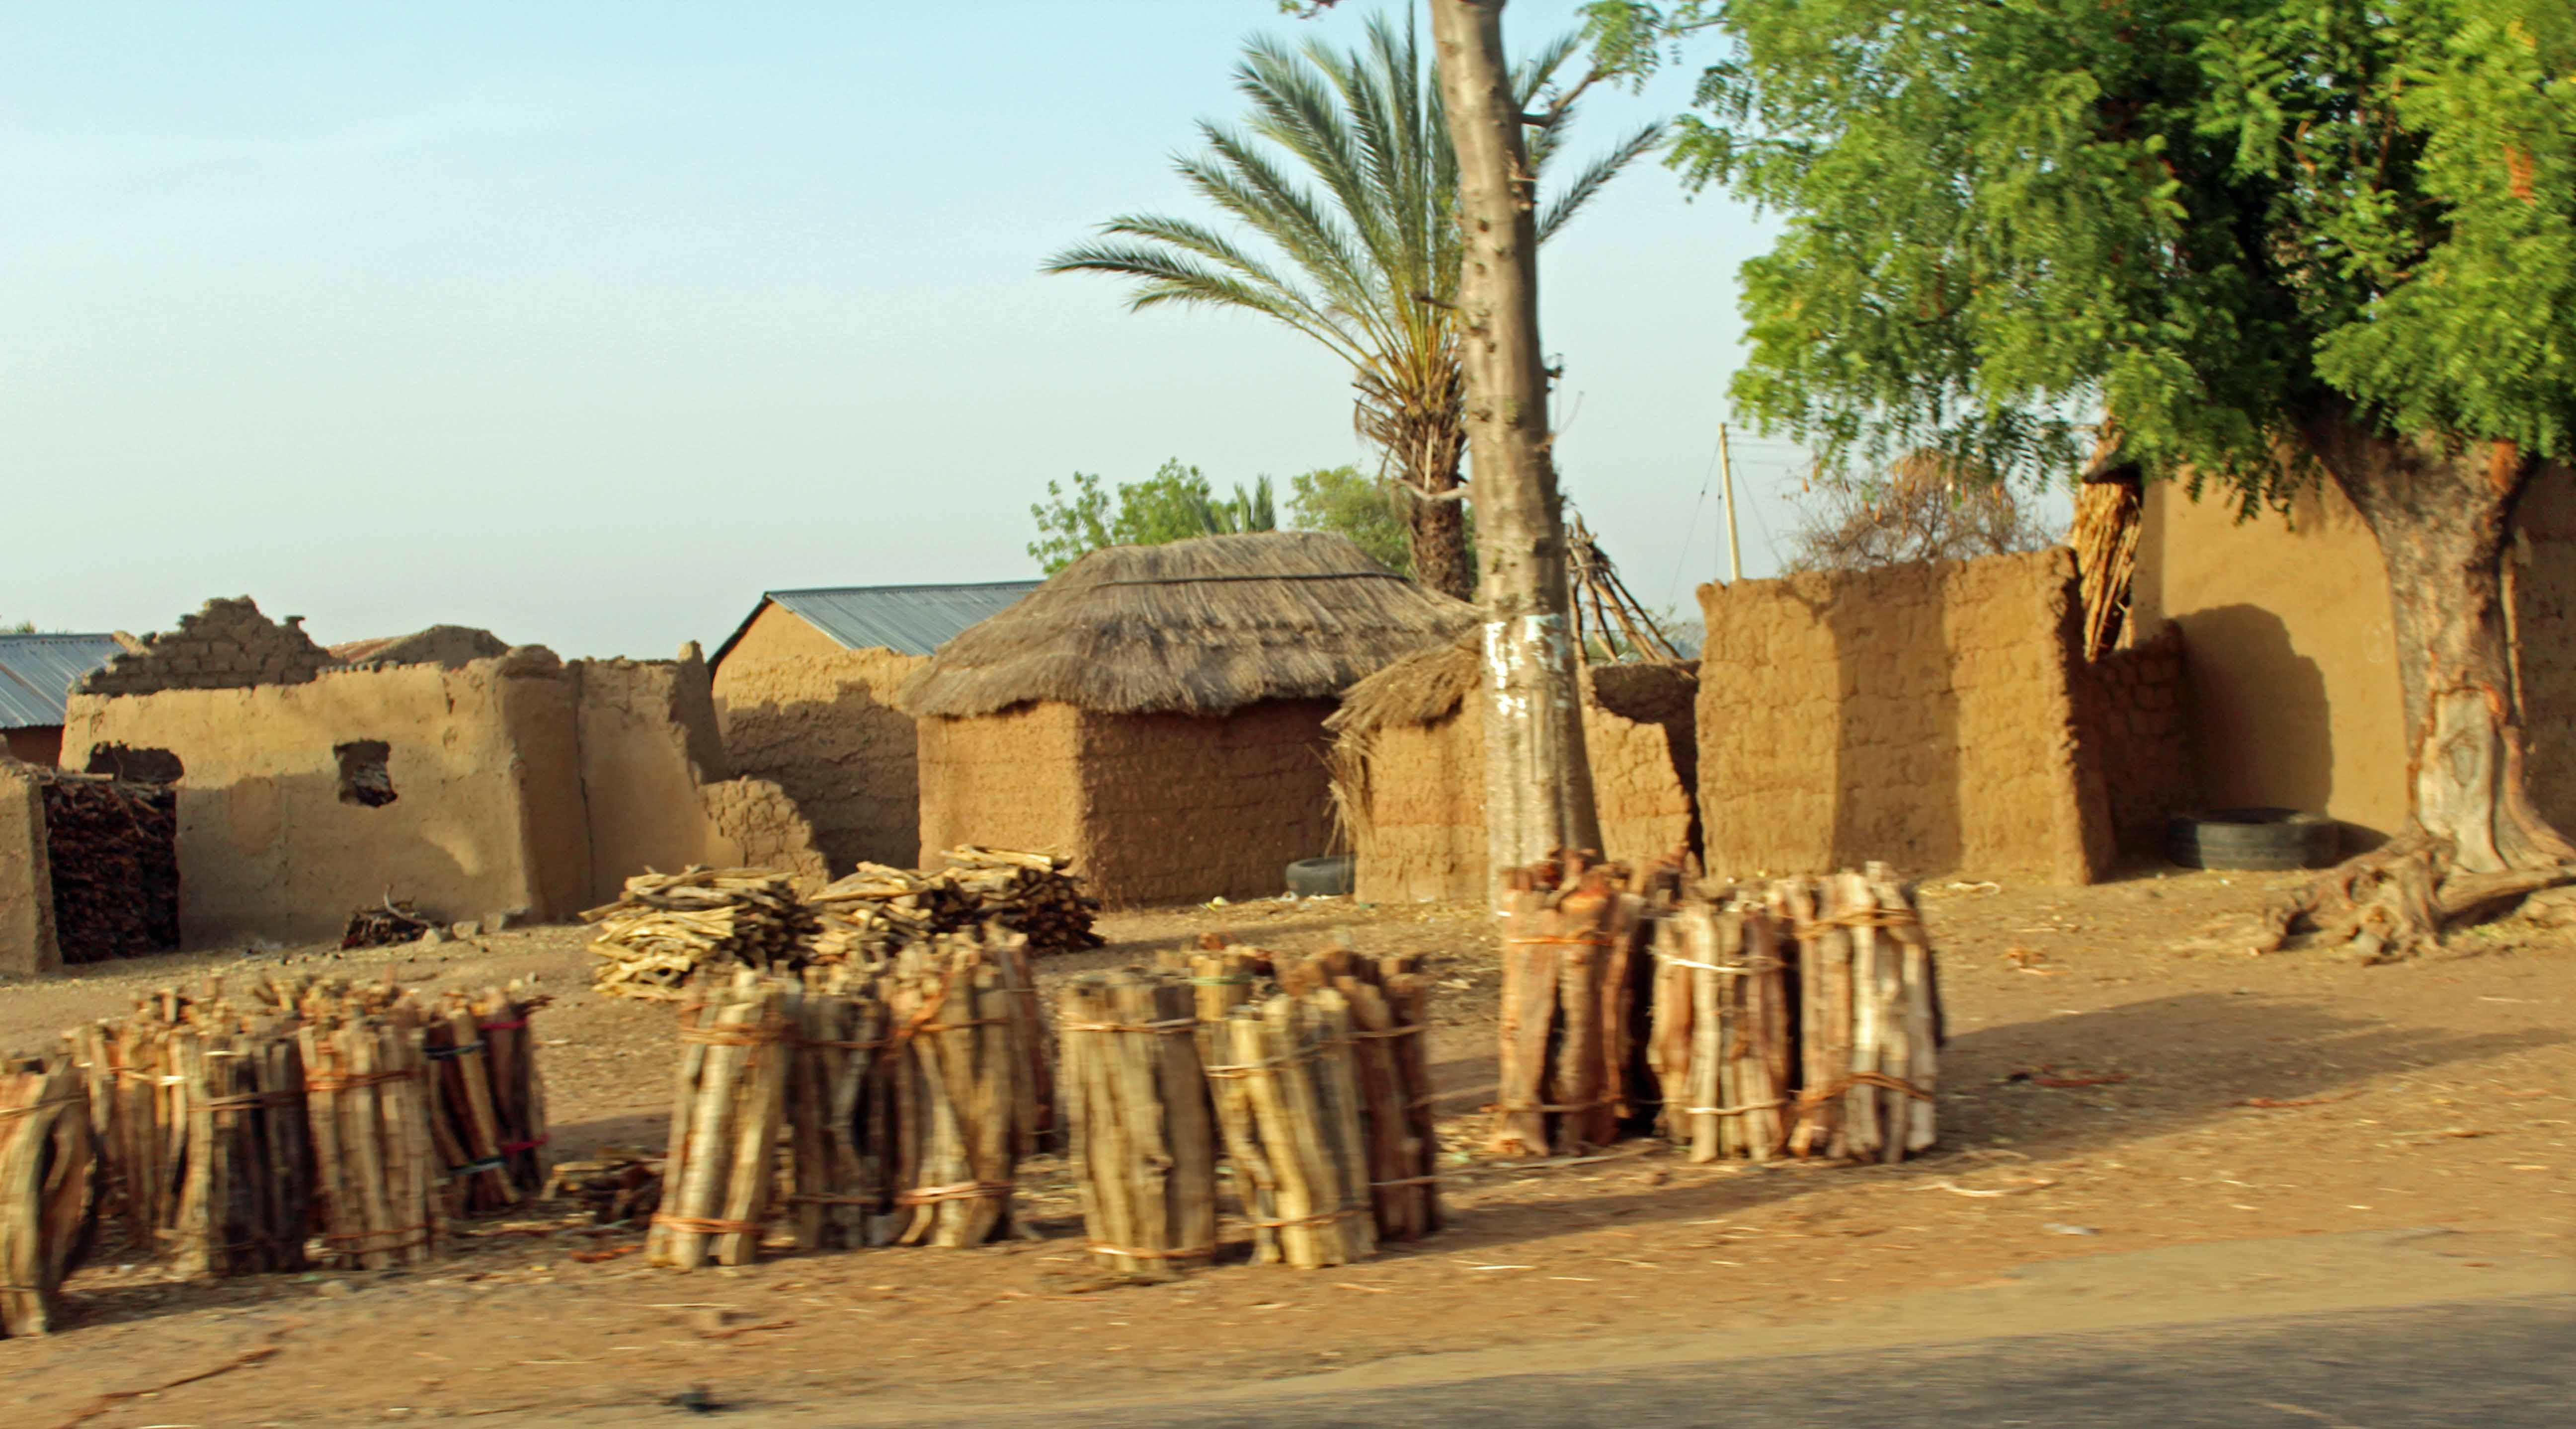 Adobe Village in Gombe Nigeria